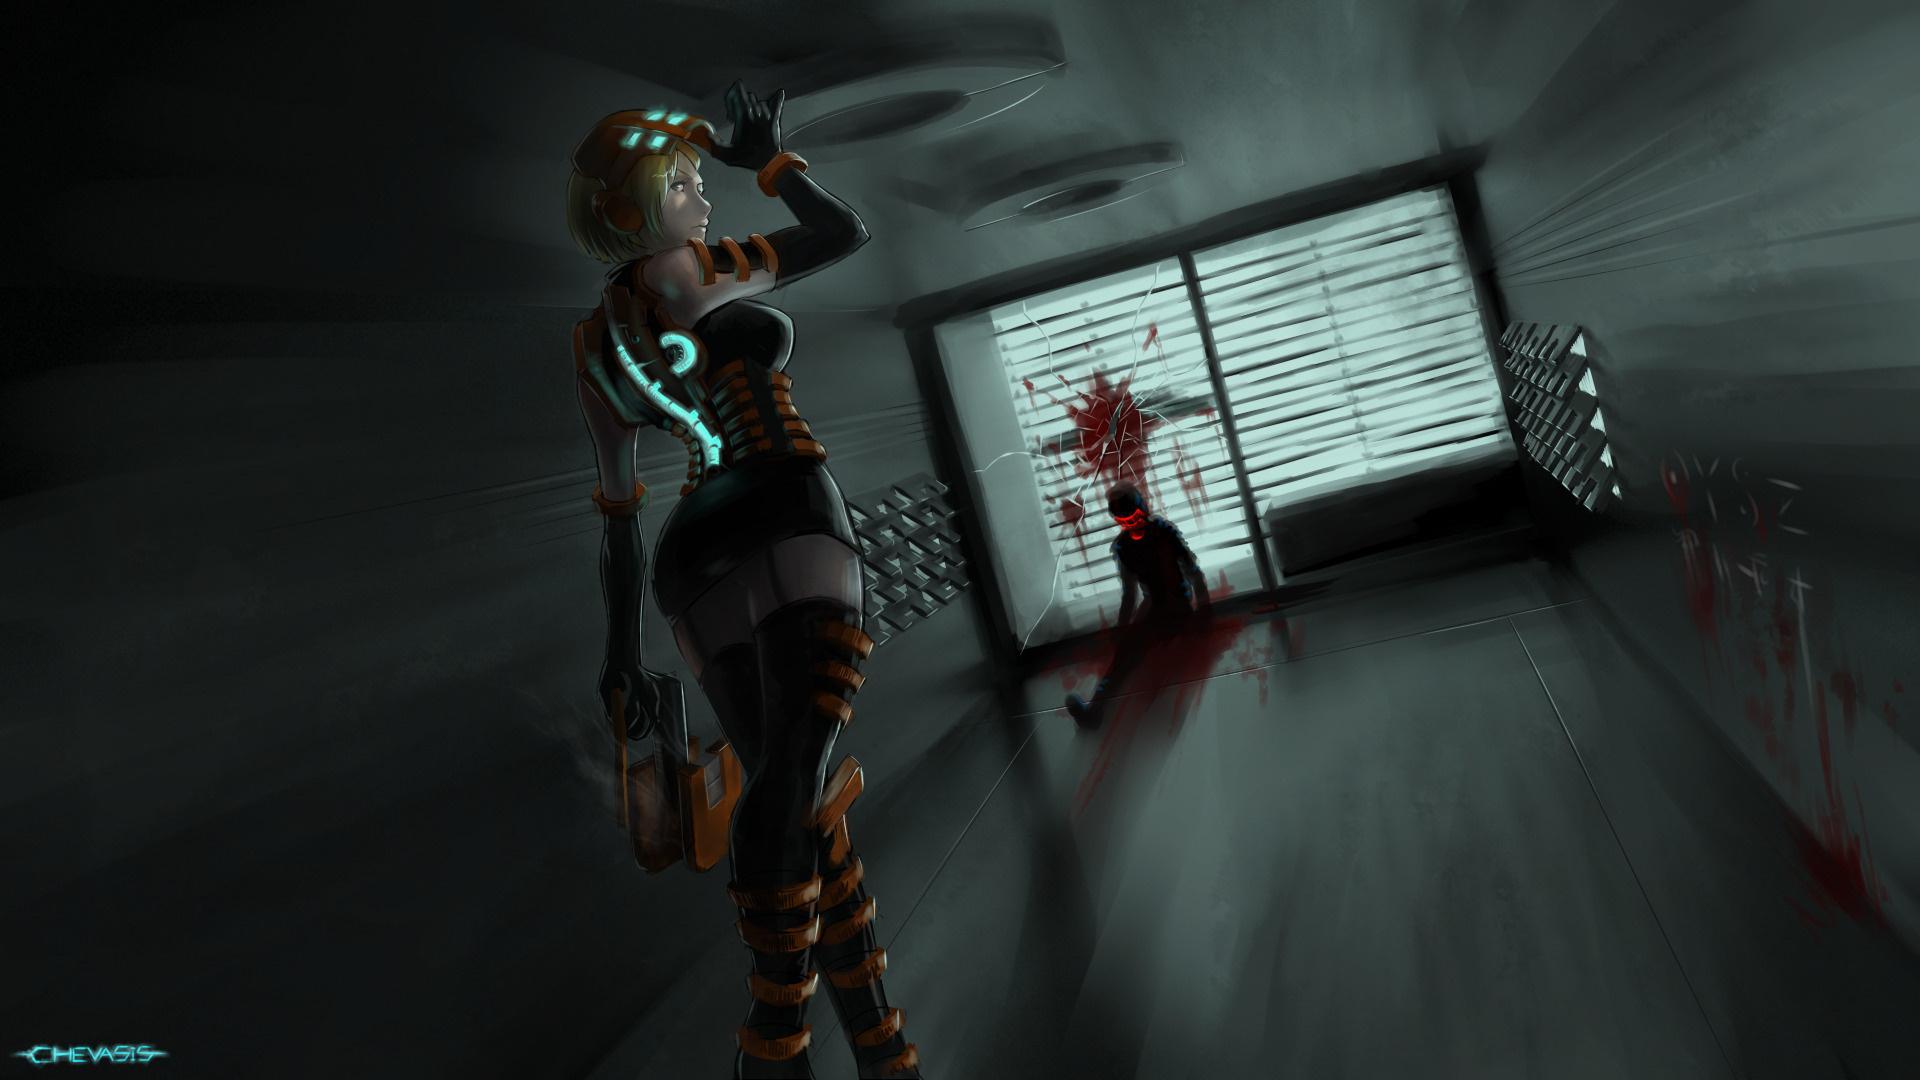 Картинка: Девушка, взгляд, оружие, резак, костюм, фантастика, dead space, игра, Николь Бреннан, арт, chevasis, комната, тело